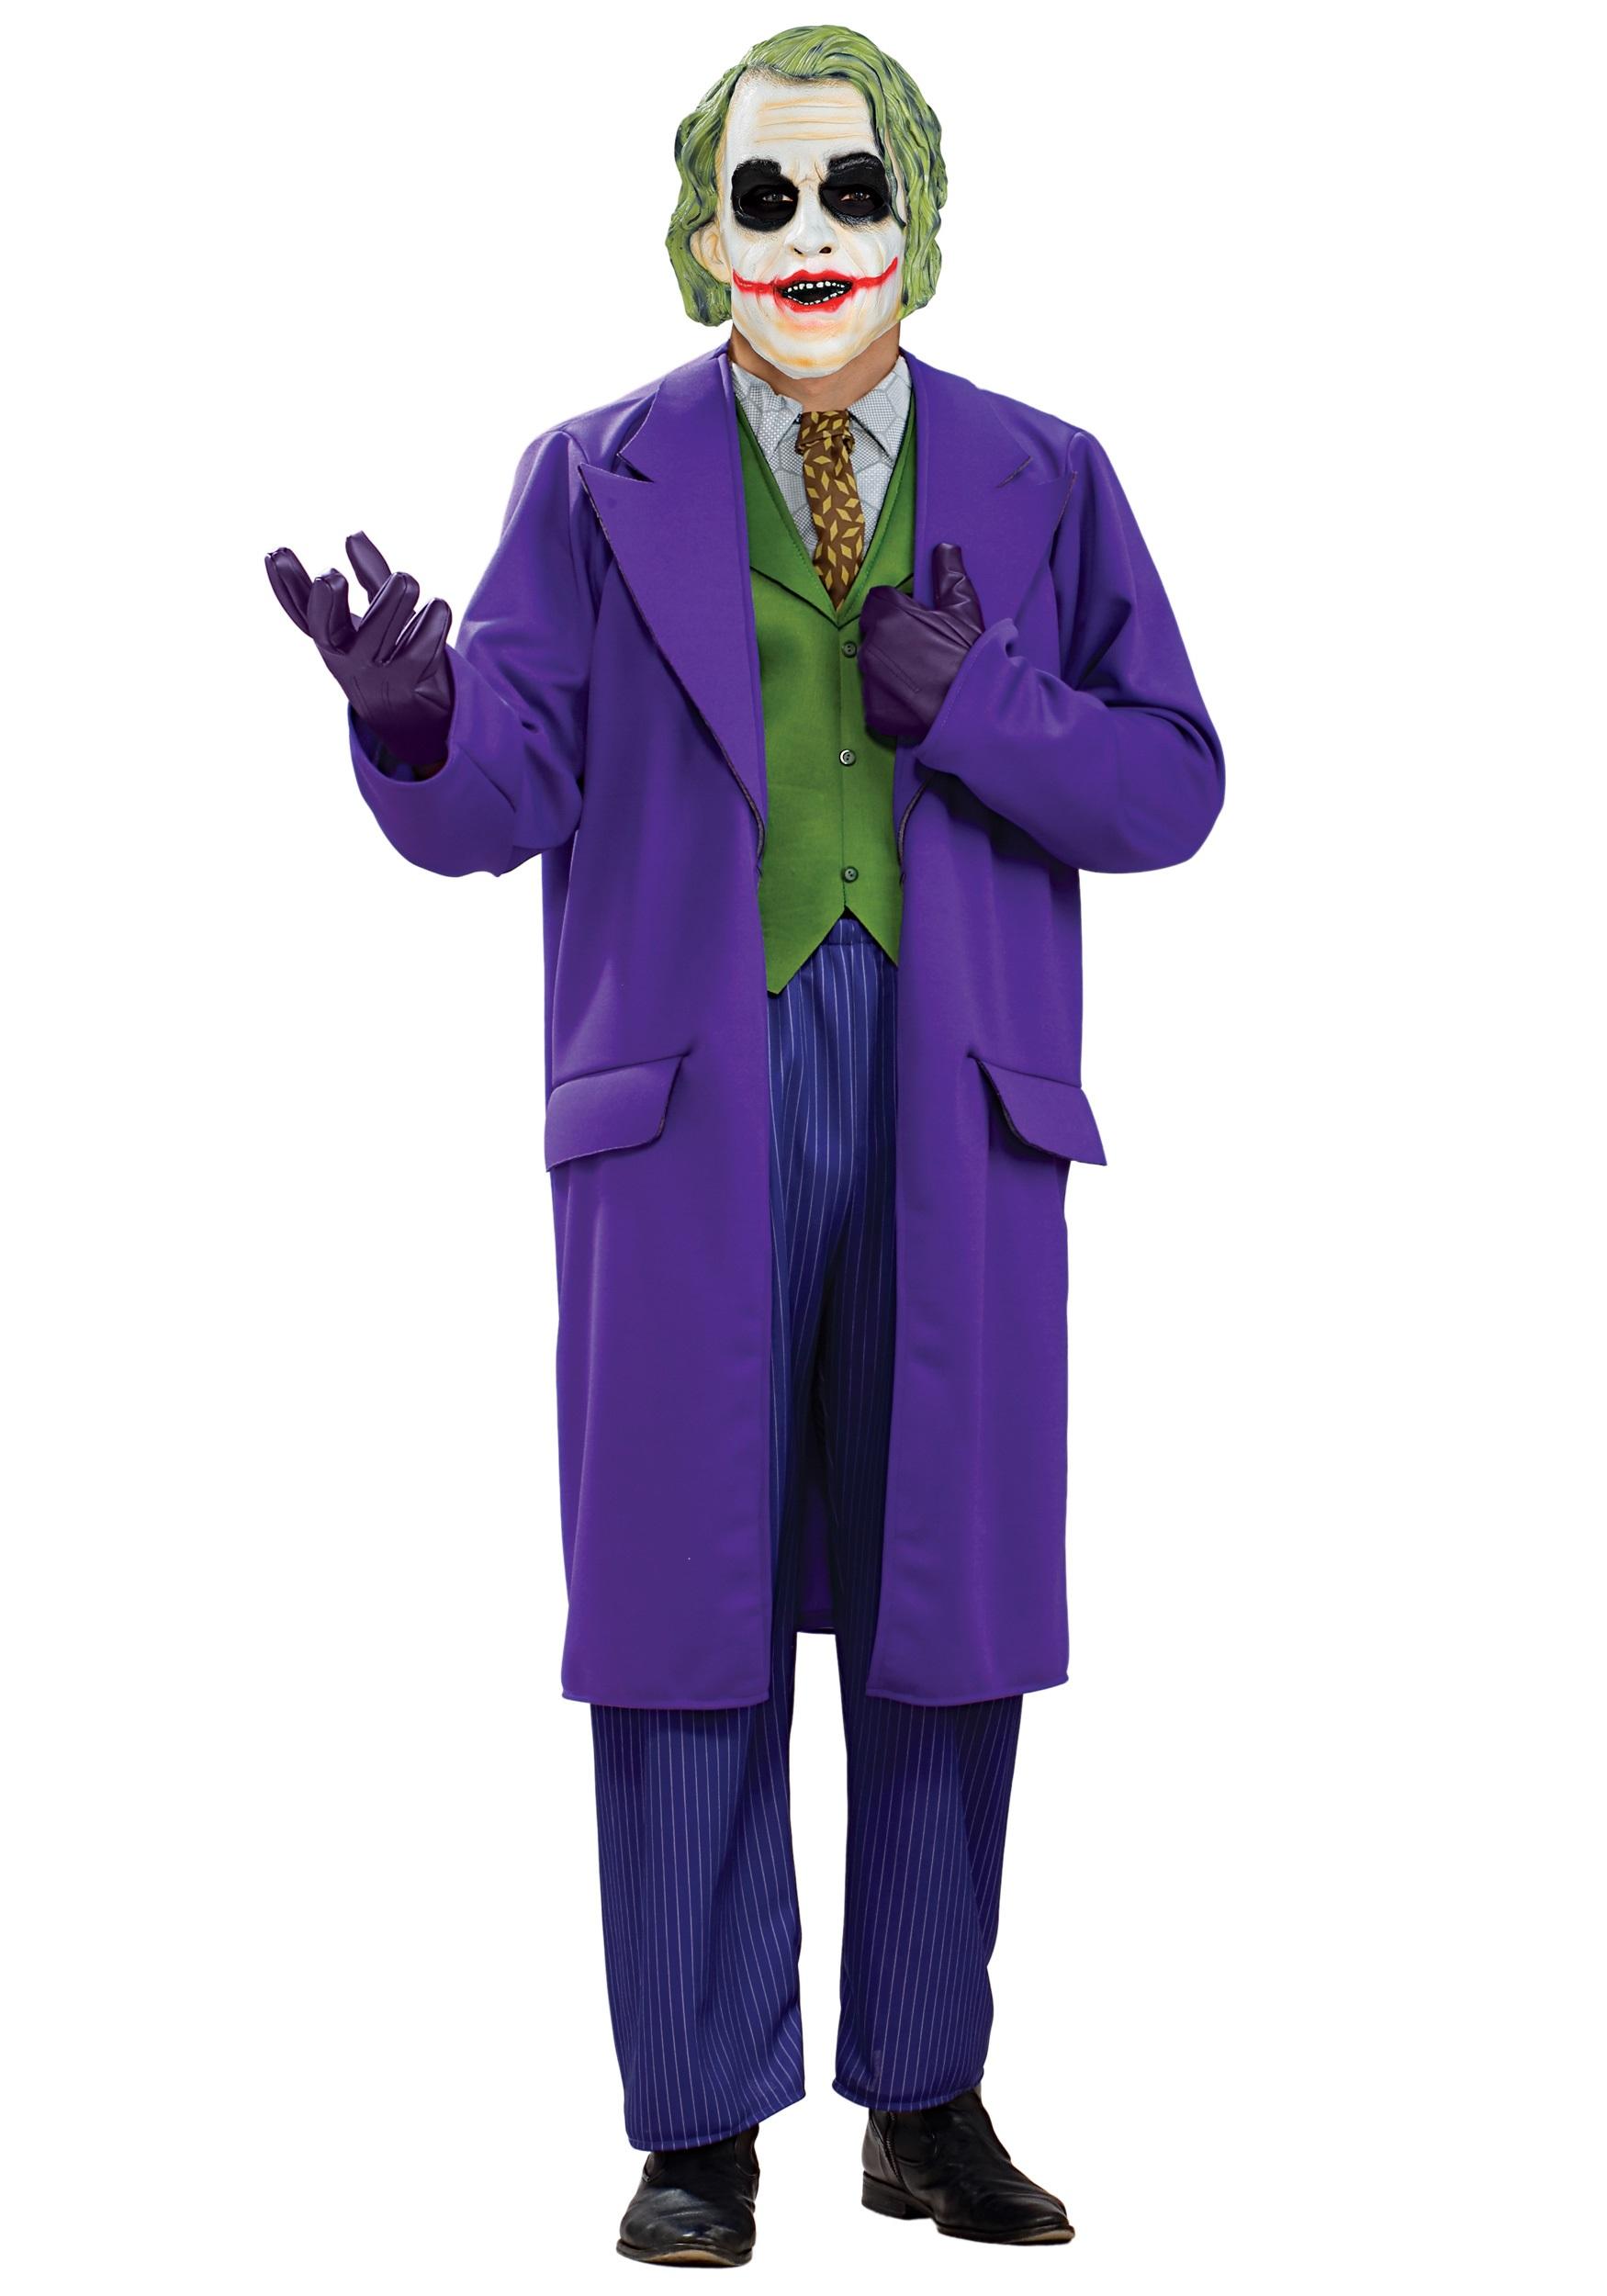 Plus Size Deluxe Joker Costume  sc 1 st  Halloween Costumes UK & Batman Costumes - Adult Child Batman Halloween Costumes